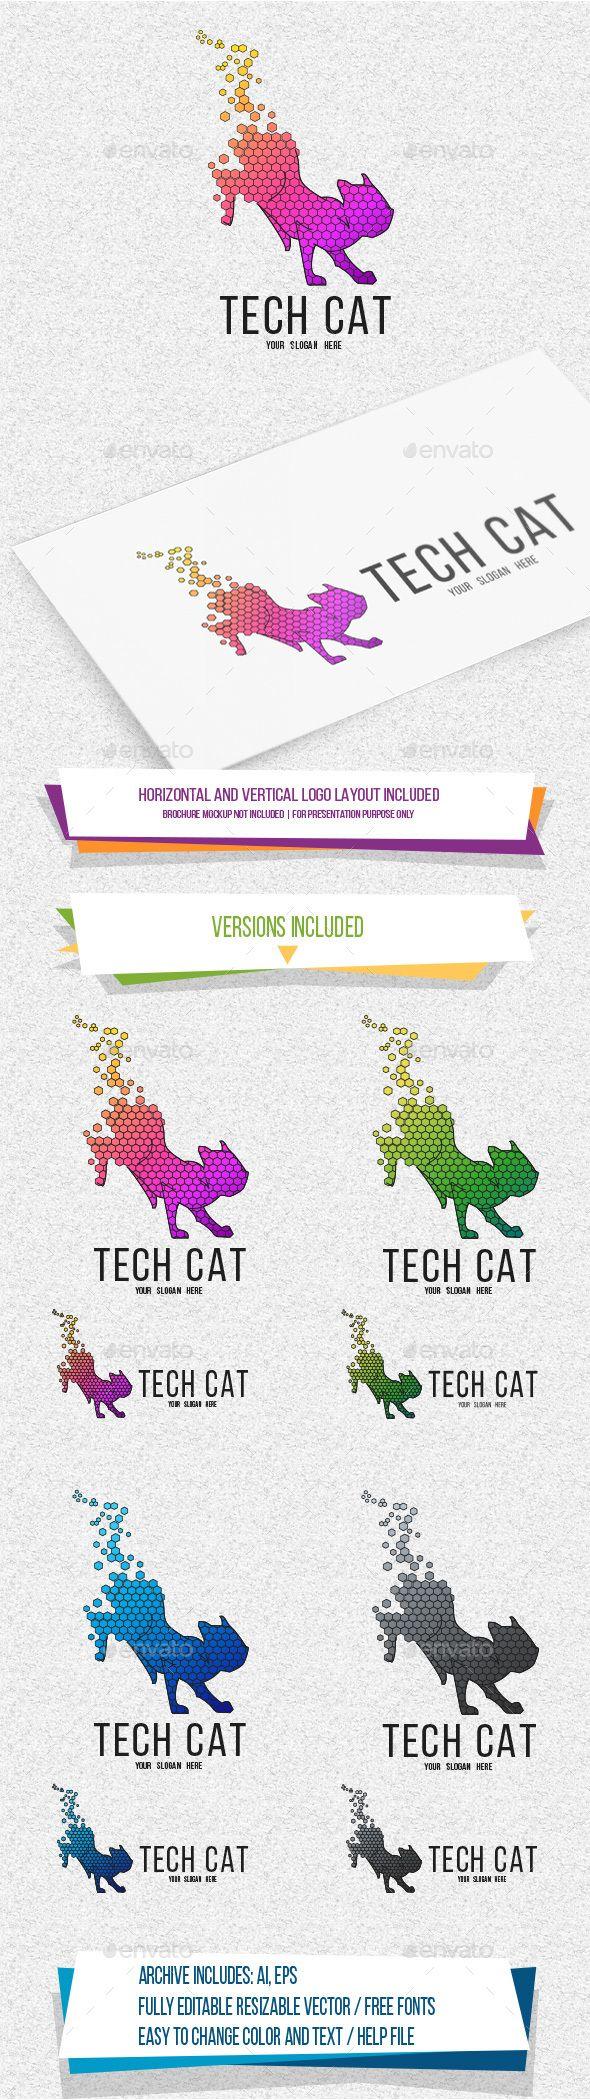 TechCat Logo Template Vector EPS, AI Illustrator